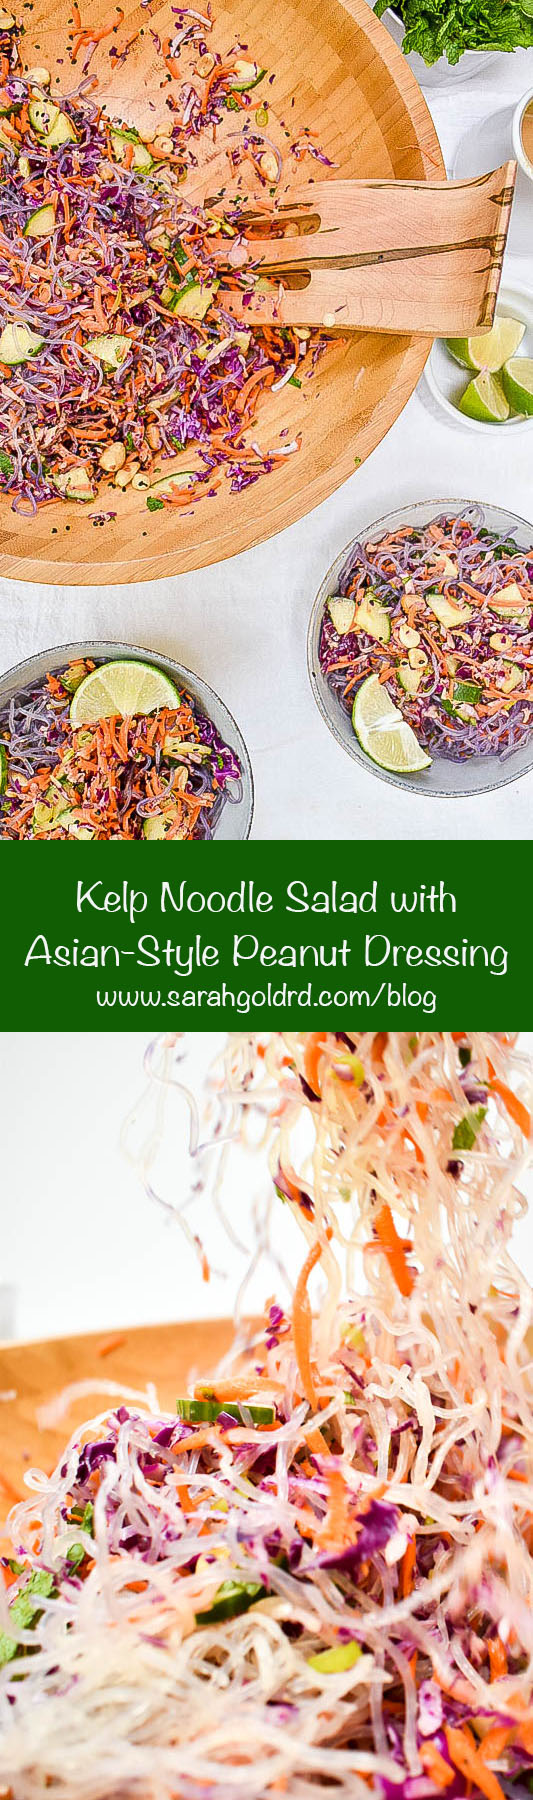 Kelp noodle salad pin.jpg